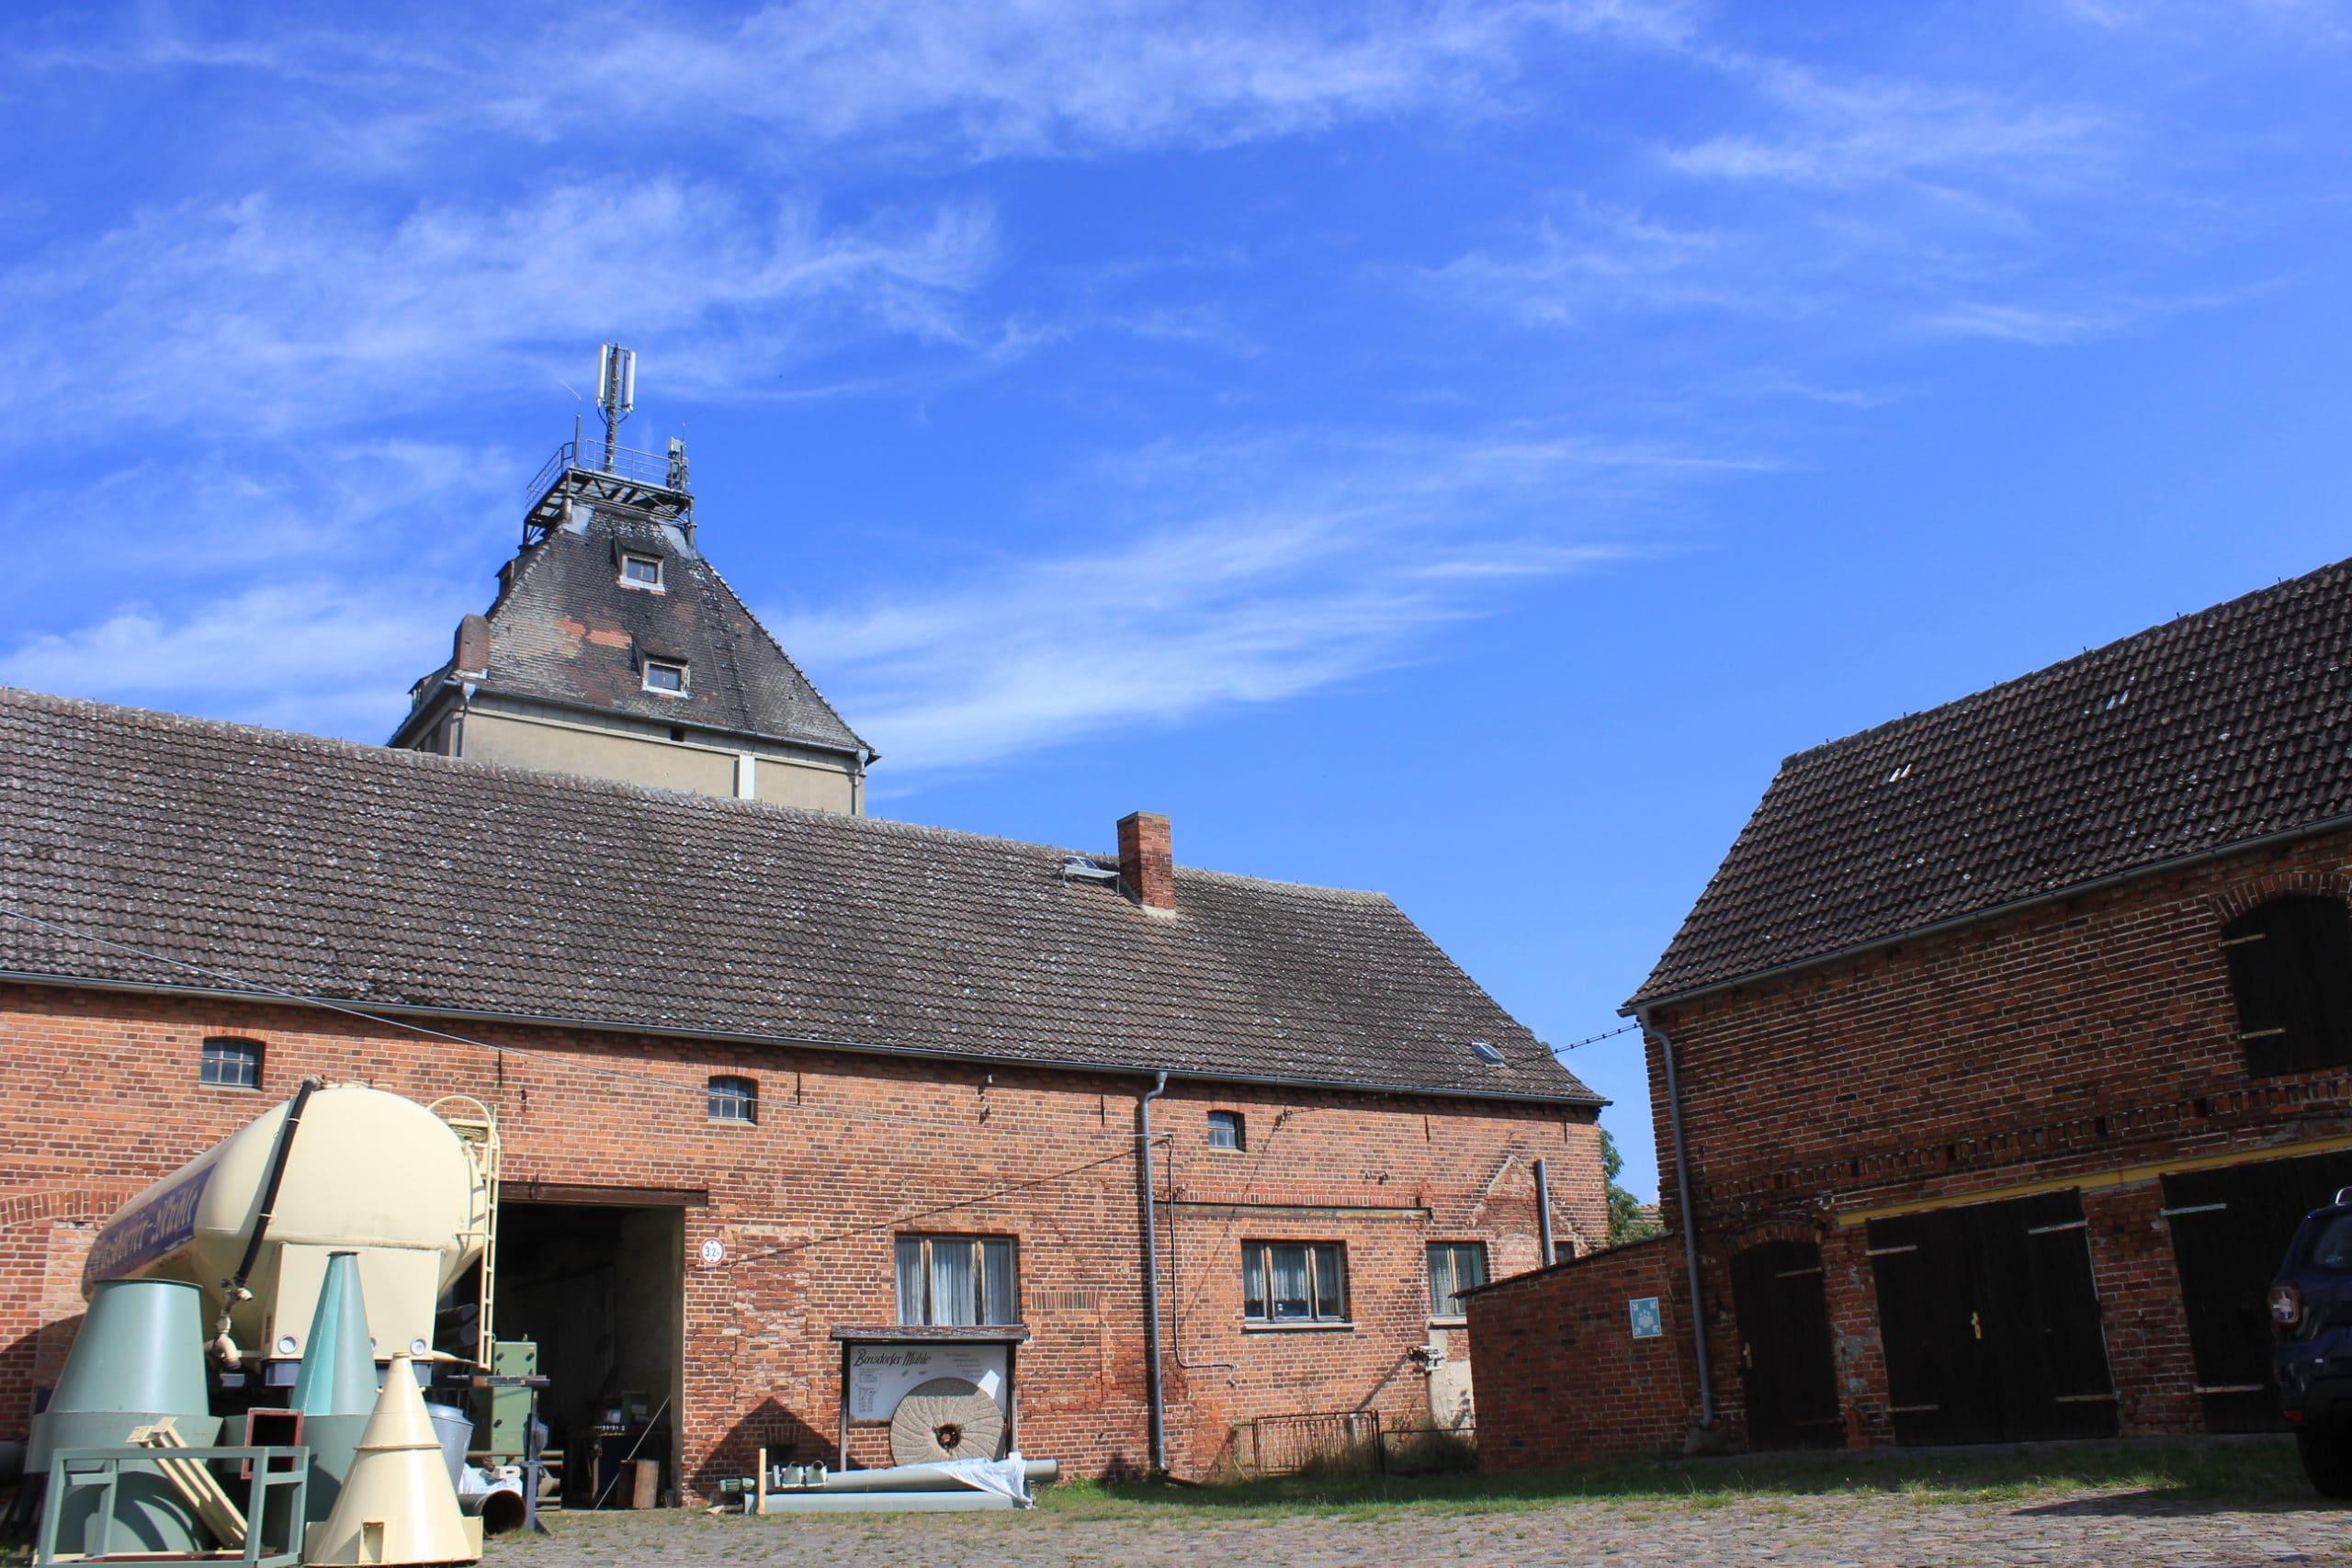 Bensdorfer Mühle